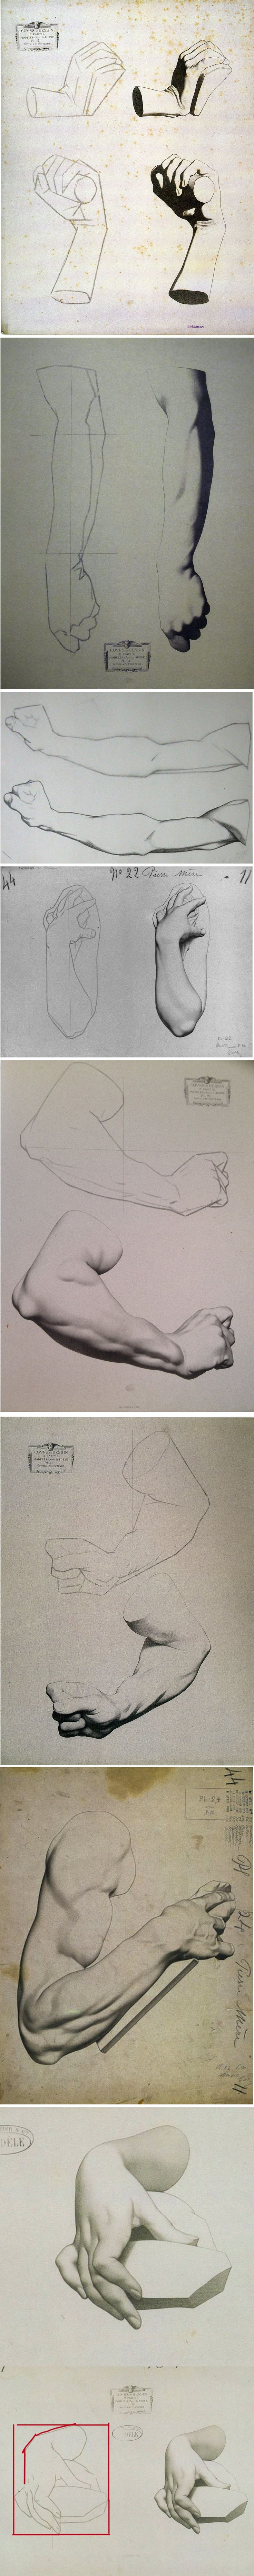 plaster hand